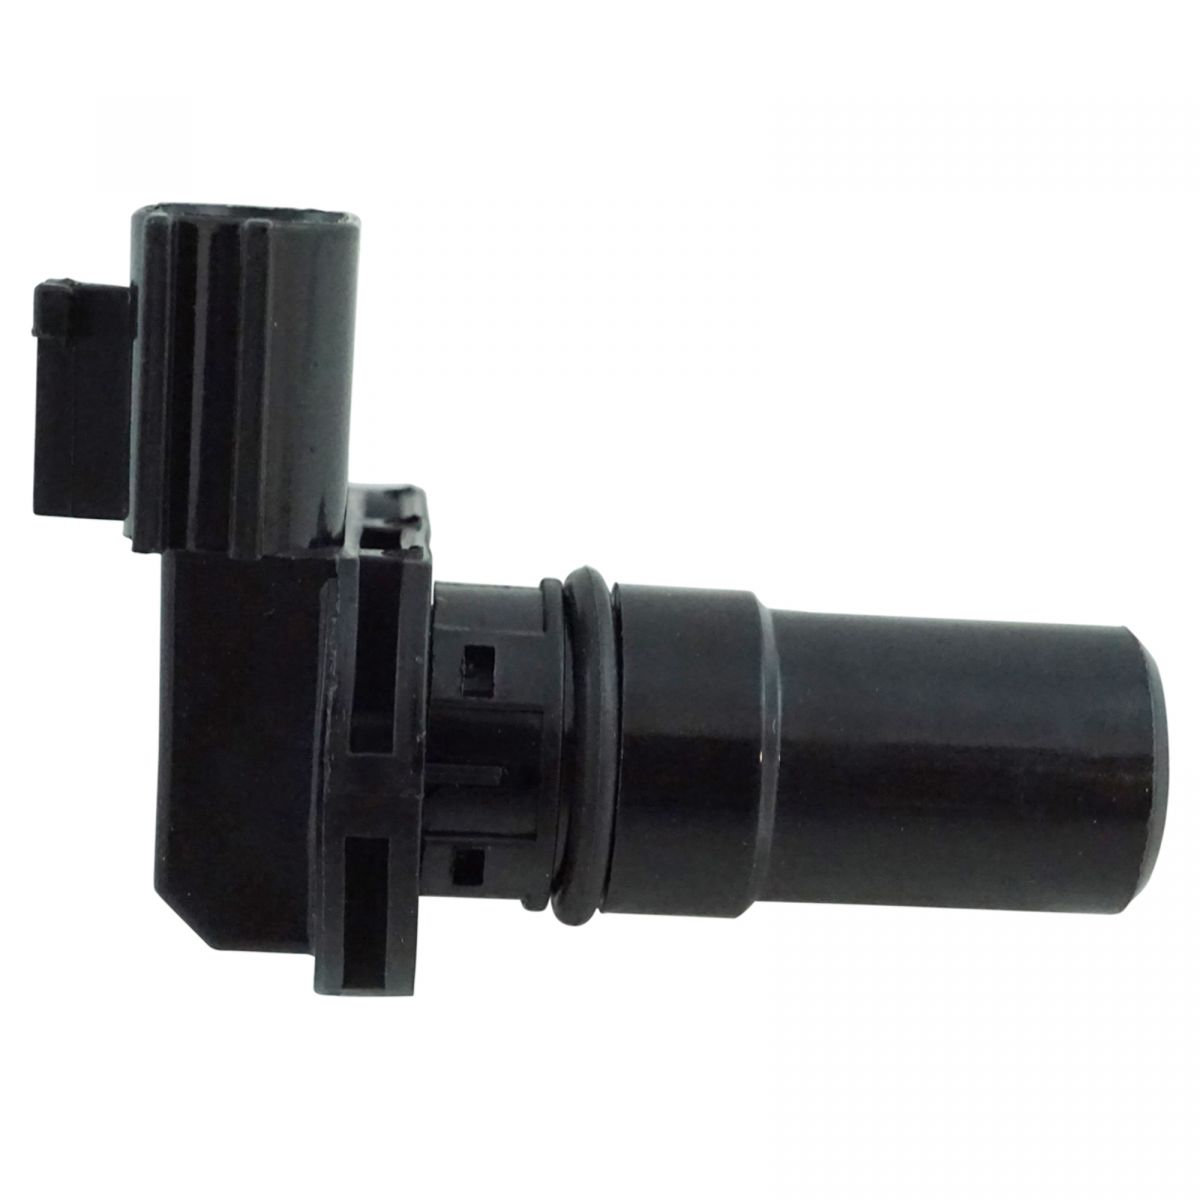 Transmission Speed Sensor for Nissan Altima Cube Juke Maxima Murano NV200 Rogue